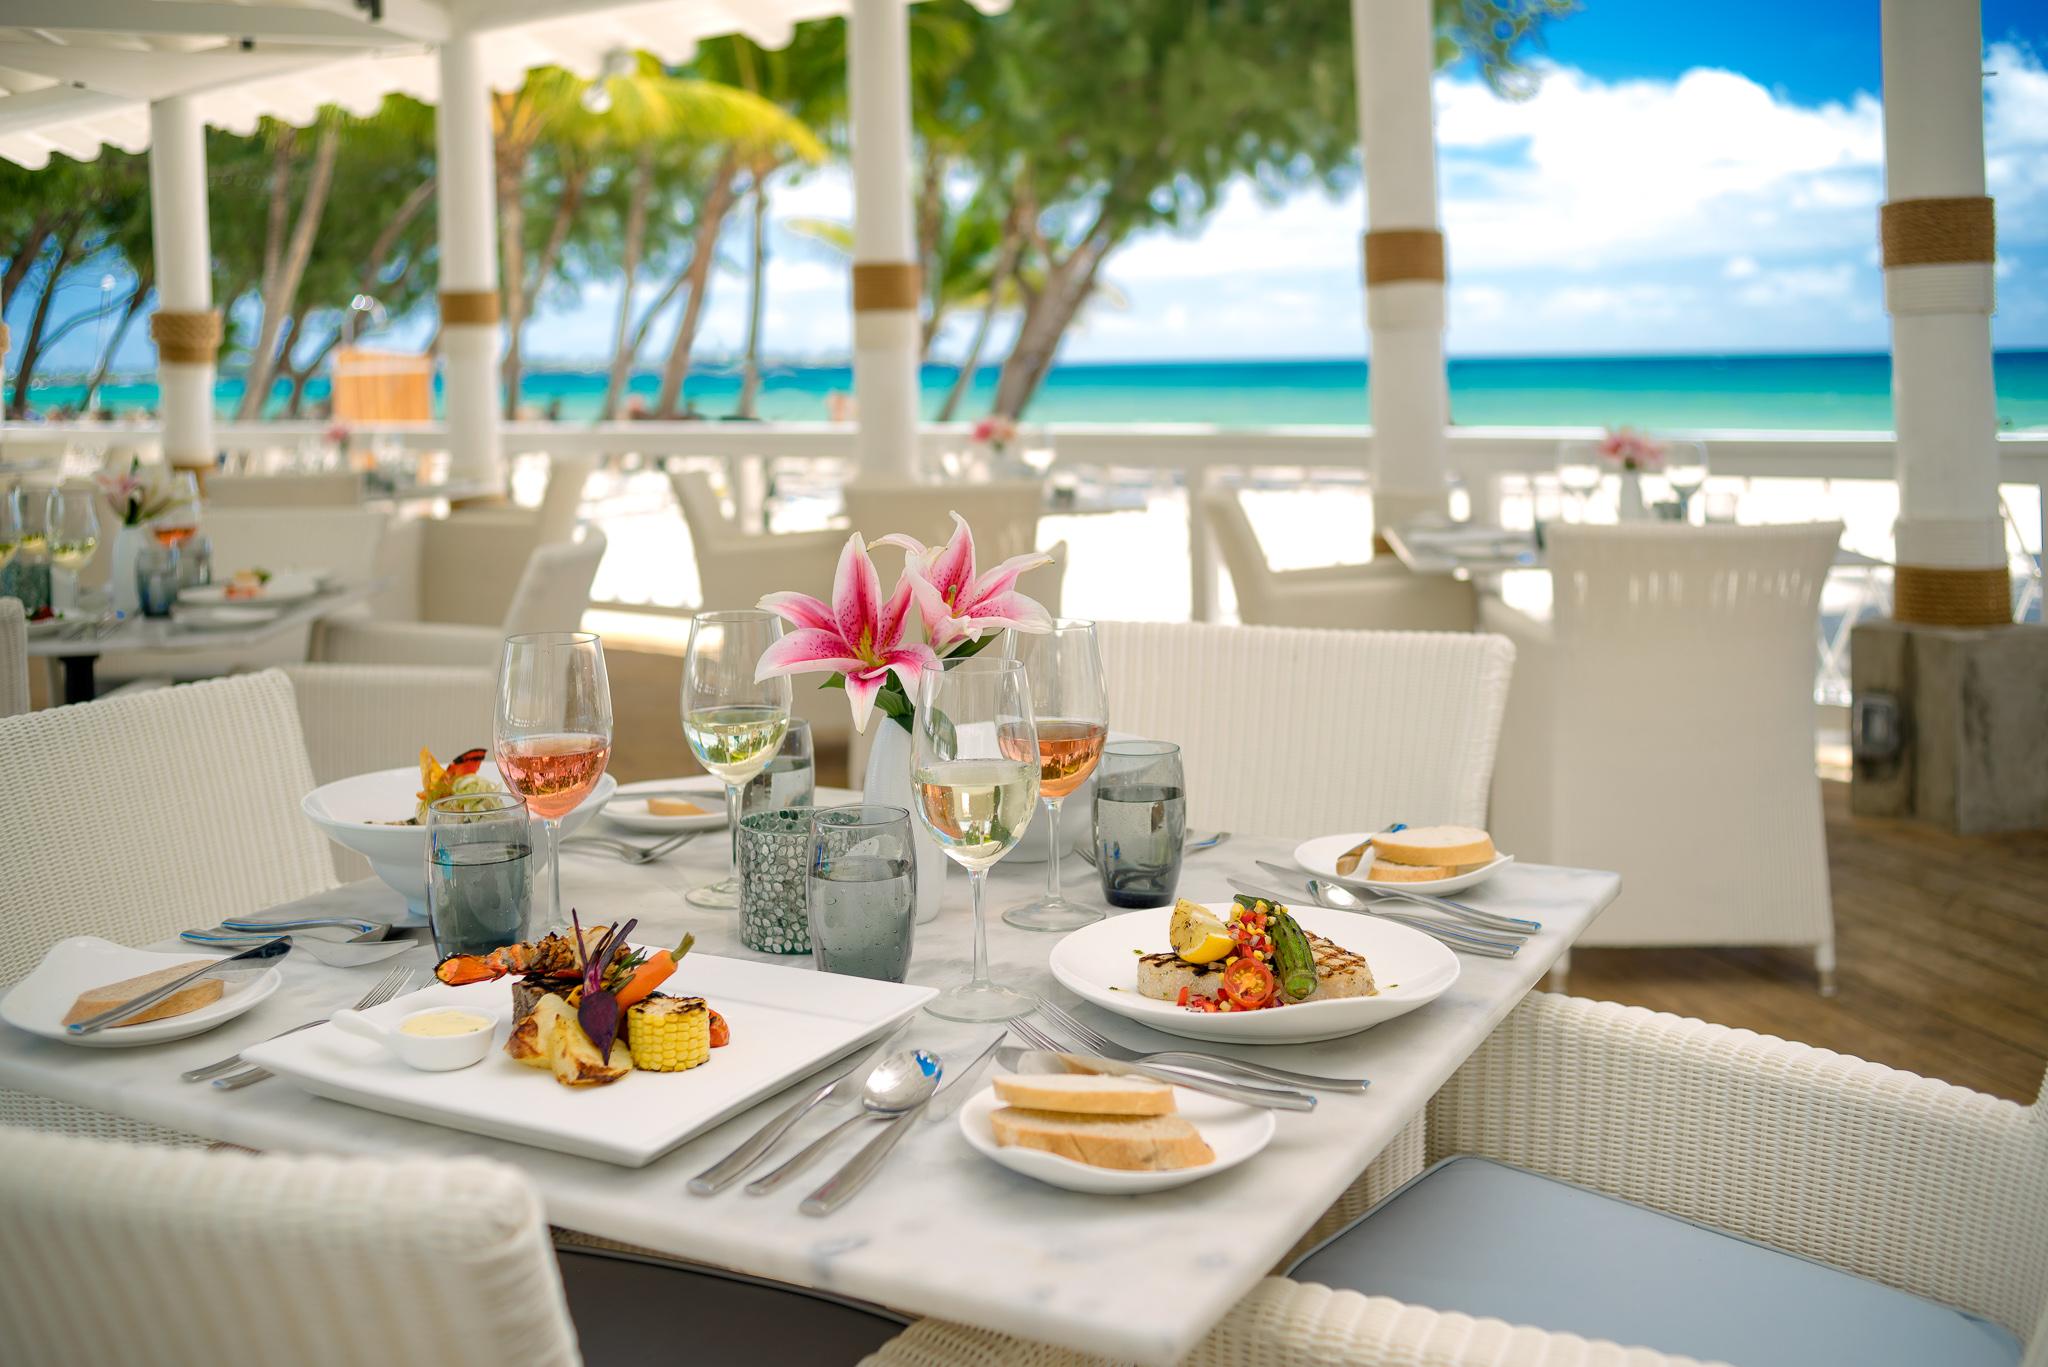 A delicious spread of food set near the Caribbean Sea.